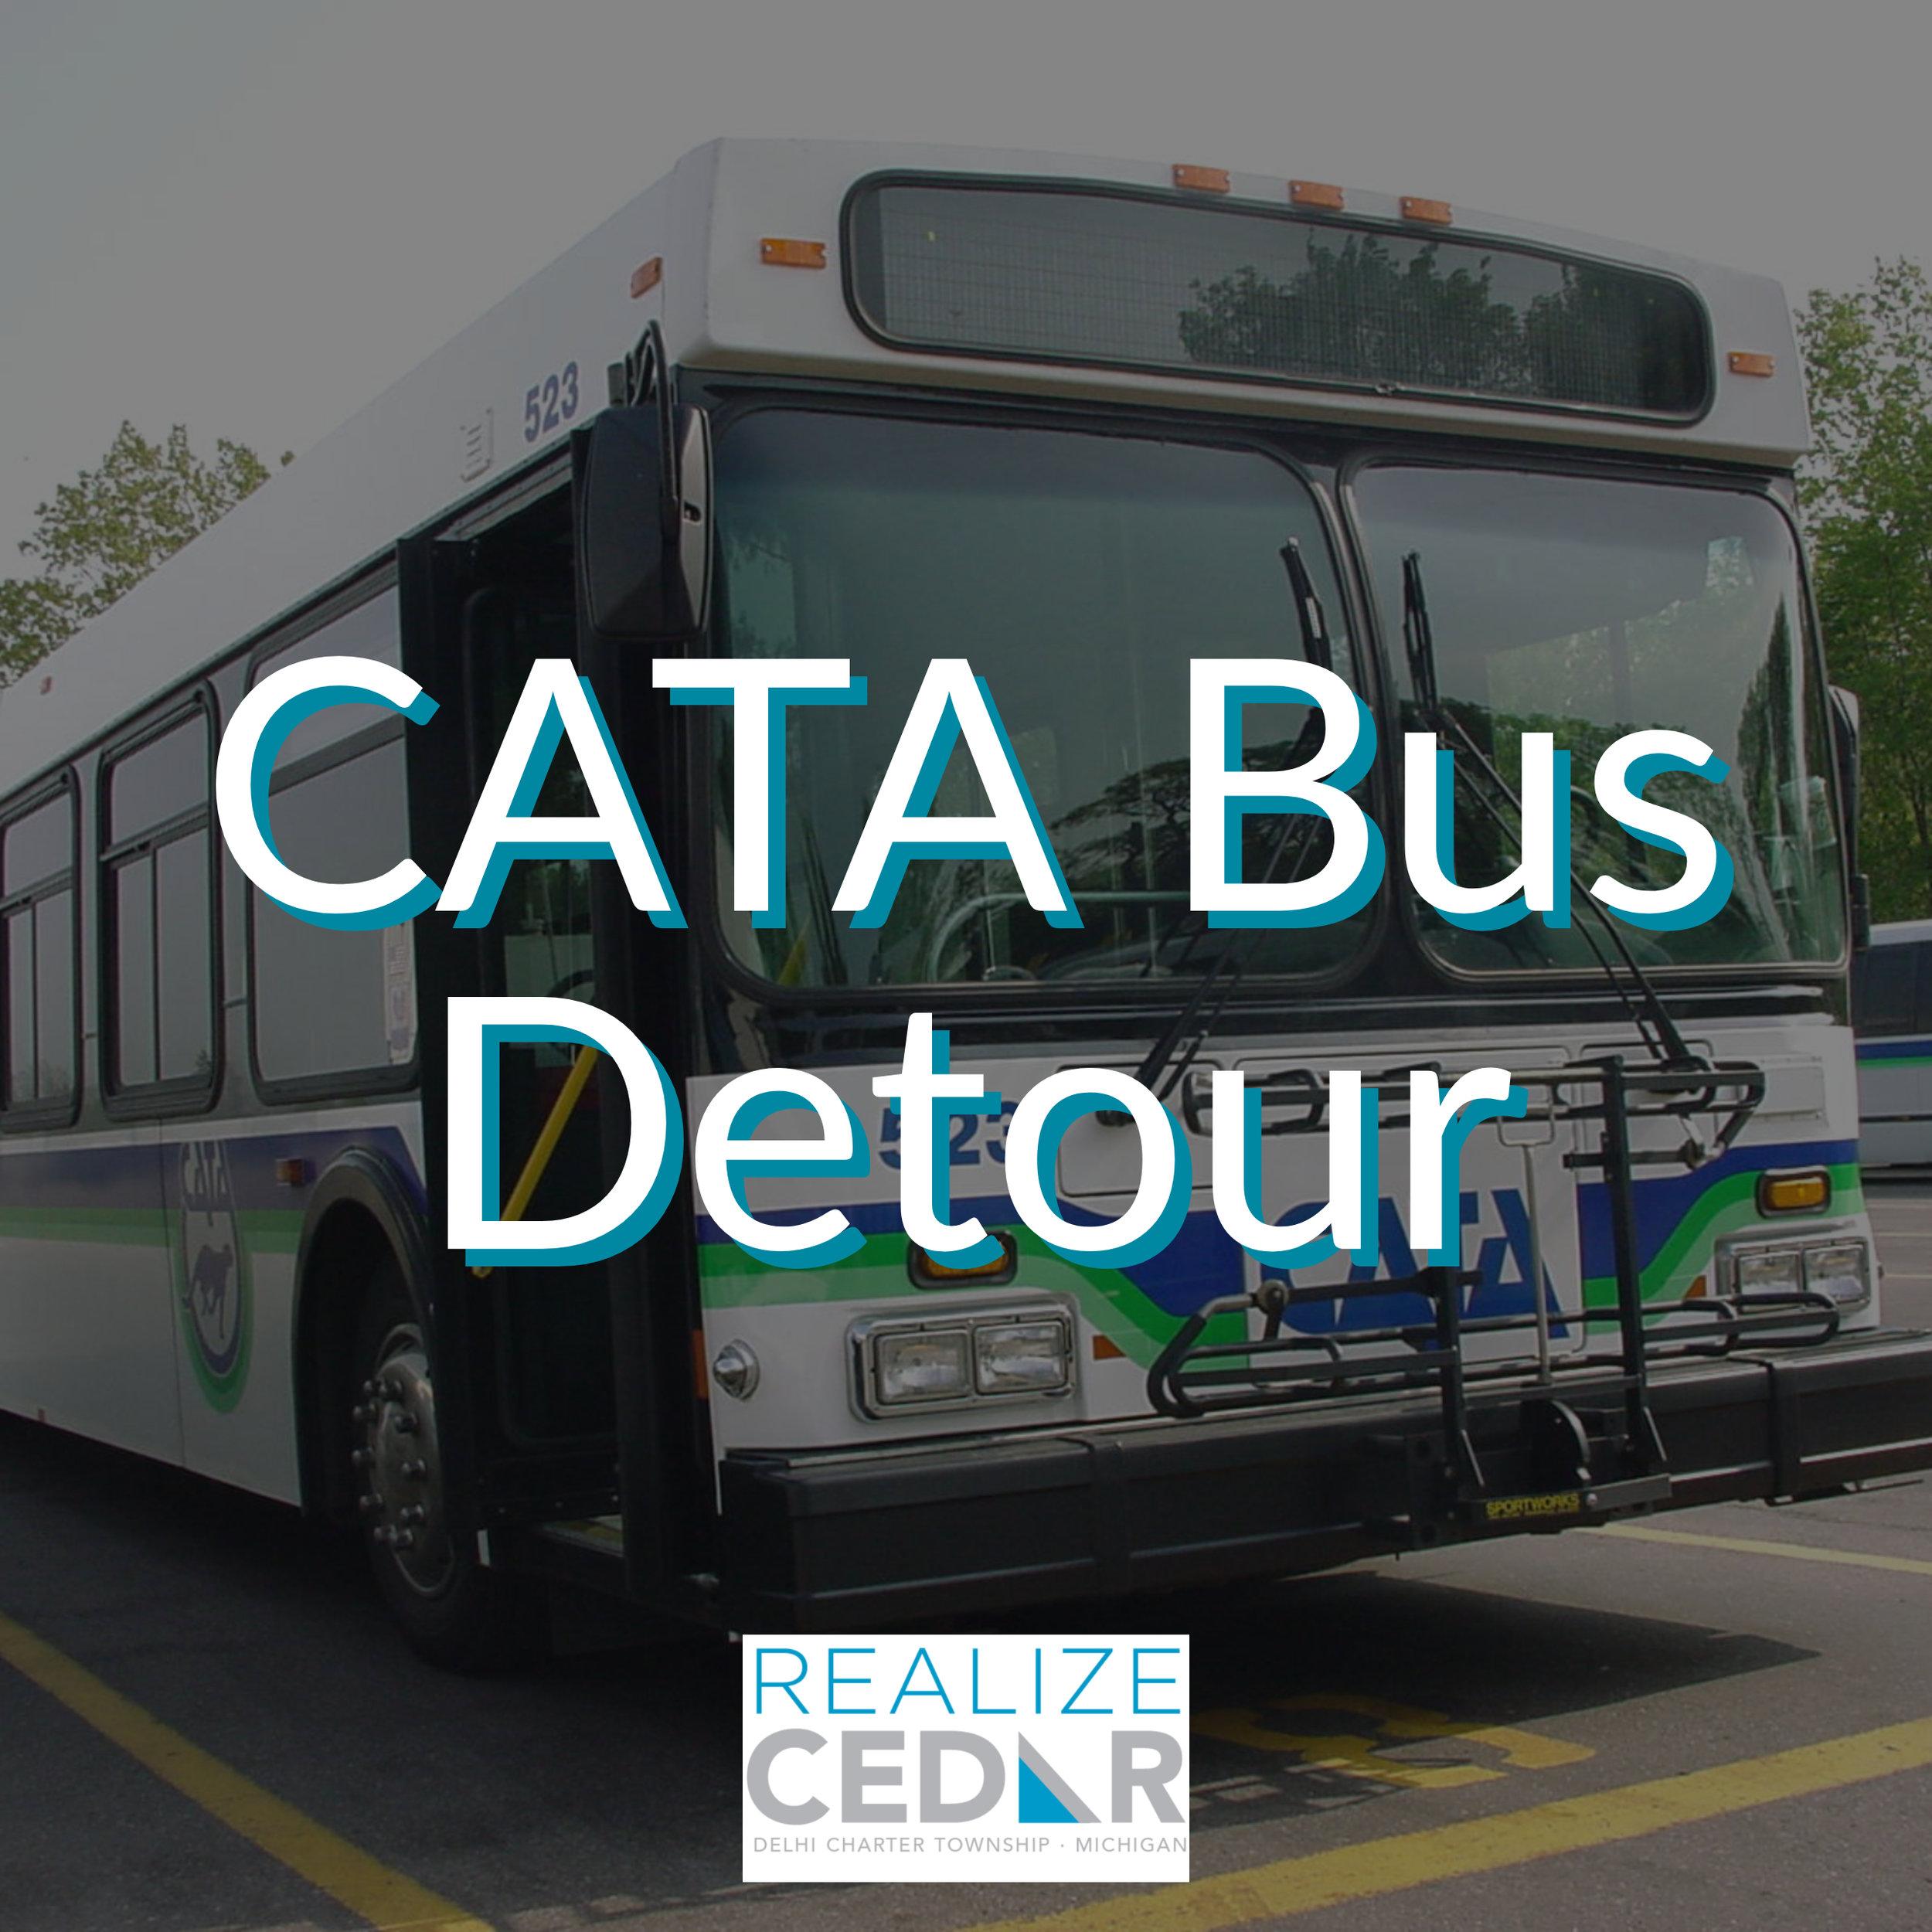 CATA_Bus_Detour.jpg